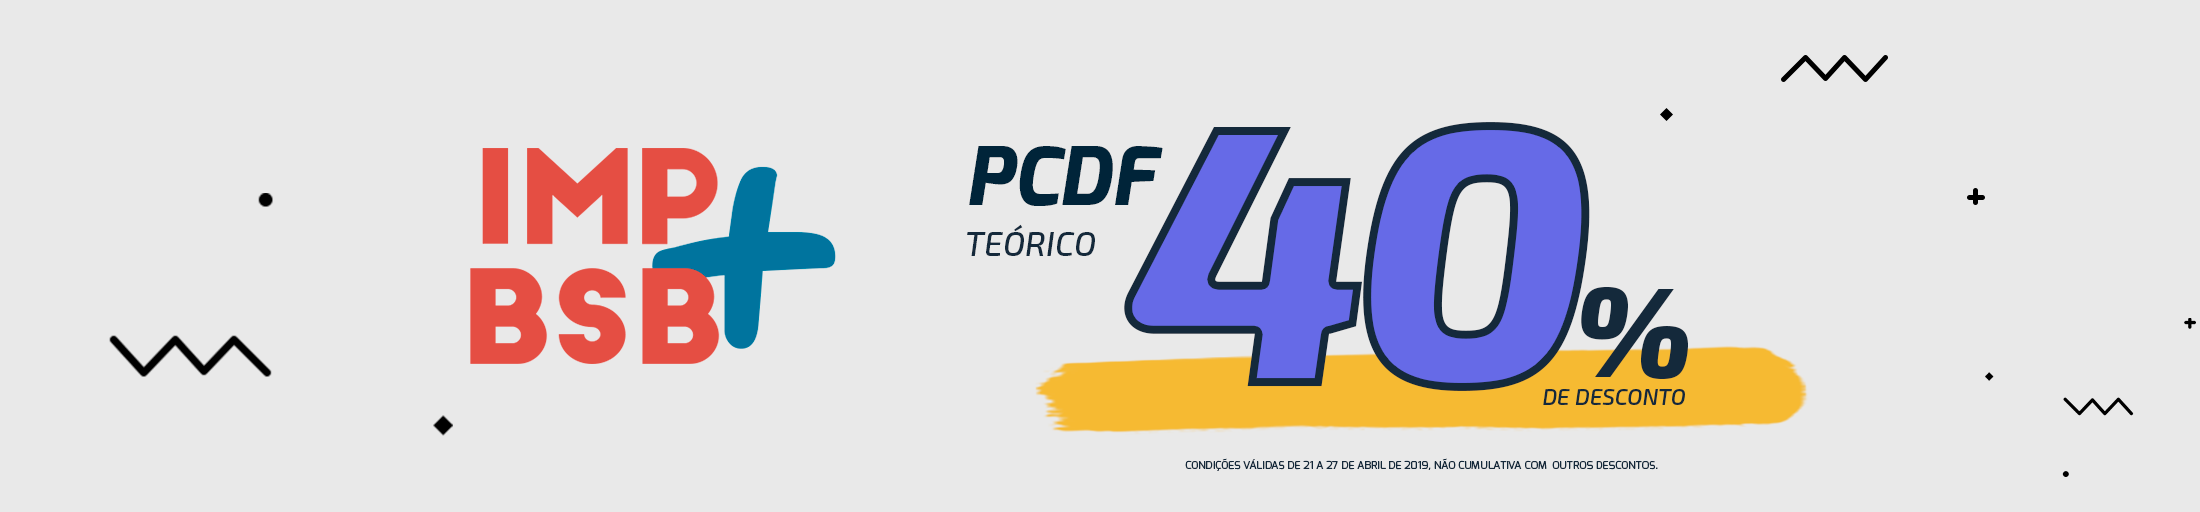 BANNER-SITE-PCDF-TEORICO